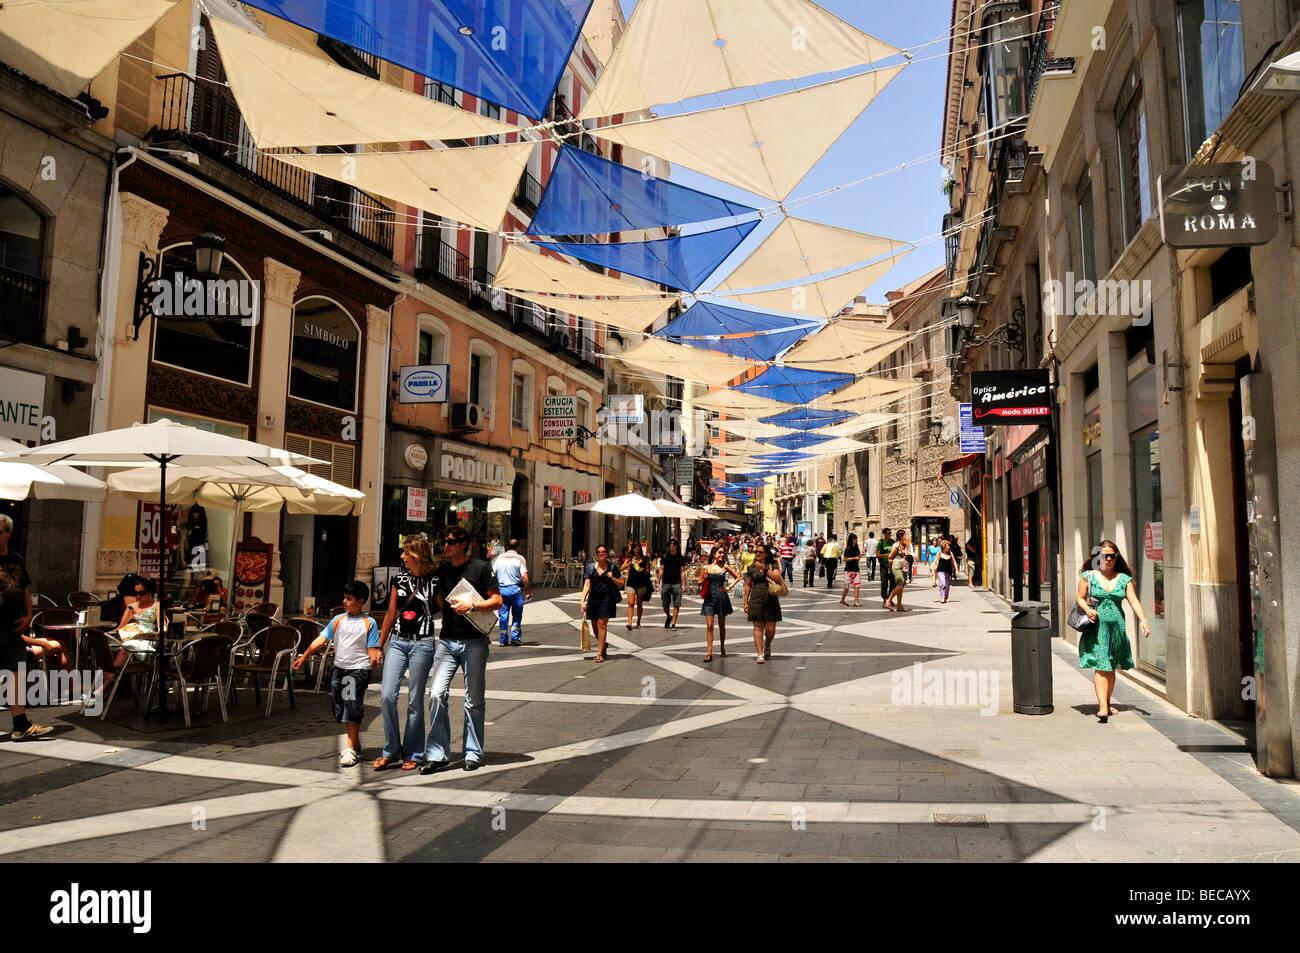 Shopping, Calle del Carmen, Madrid, Spagna, Penisola Iberica, Europa Immagini Stock